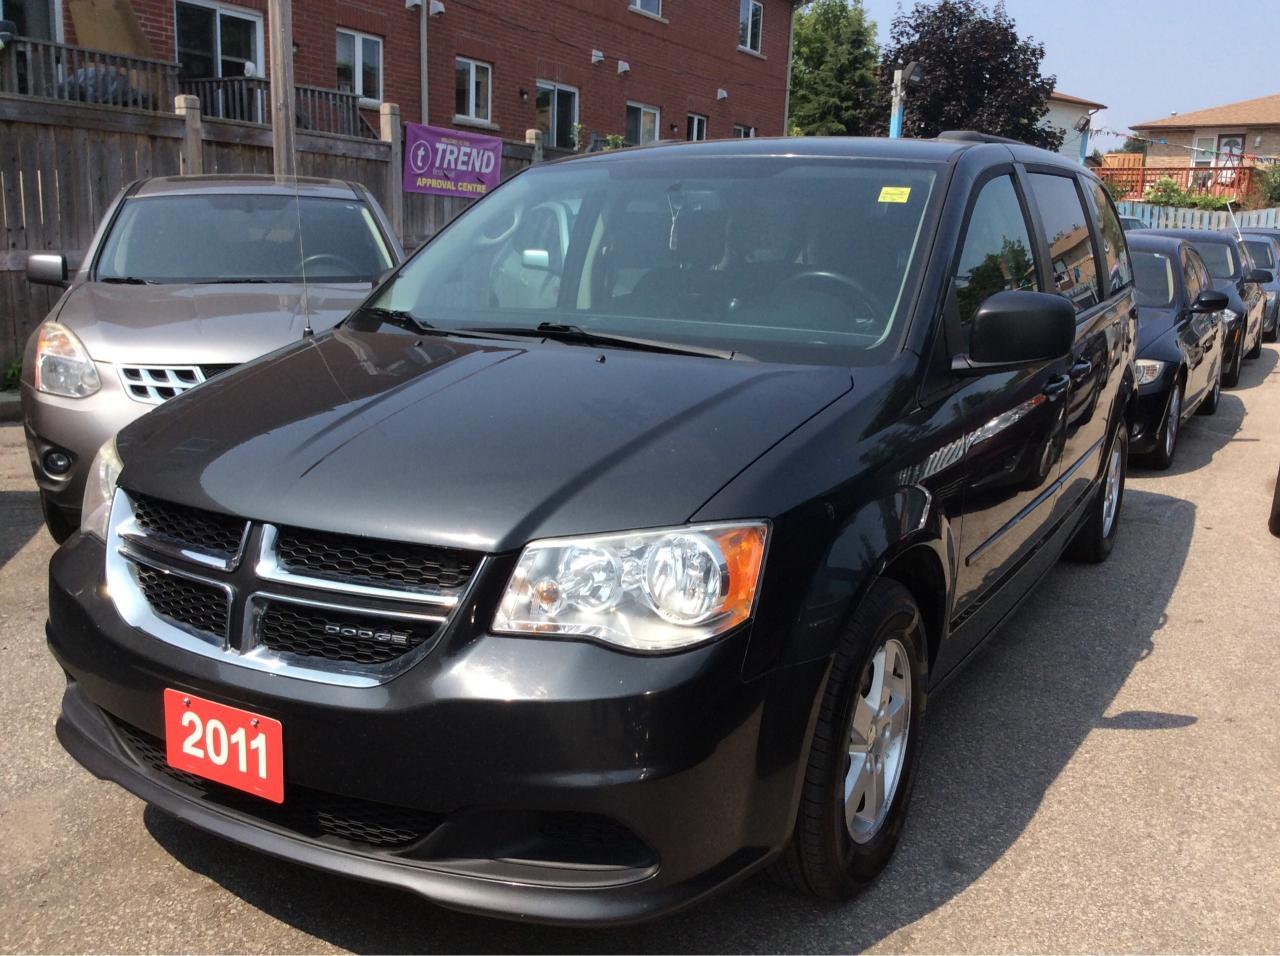 2011 Dodge Grand Caravan Alloys/Bluetooth/AUX/CLEAN CARPROOF !!!